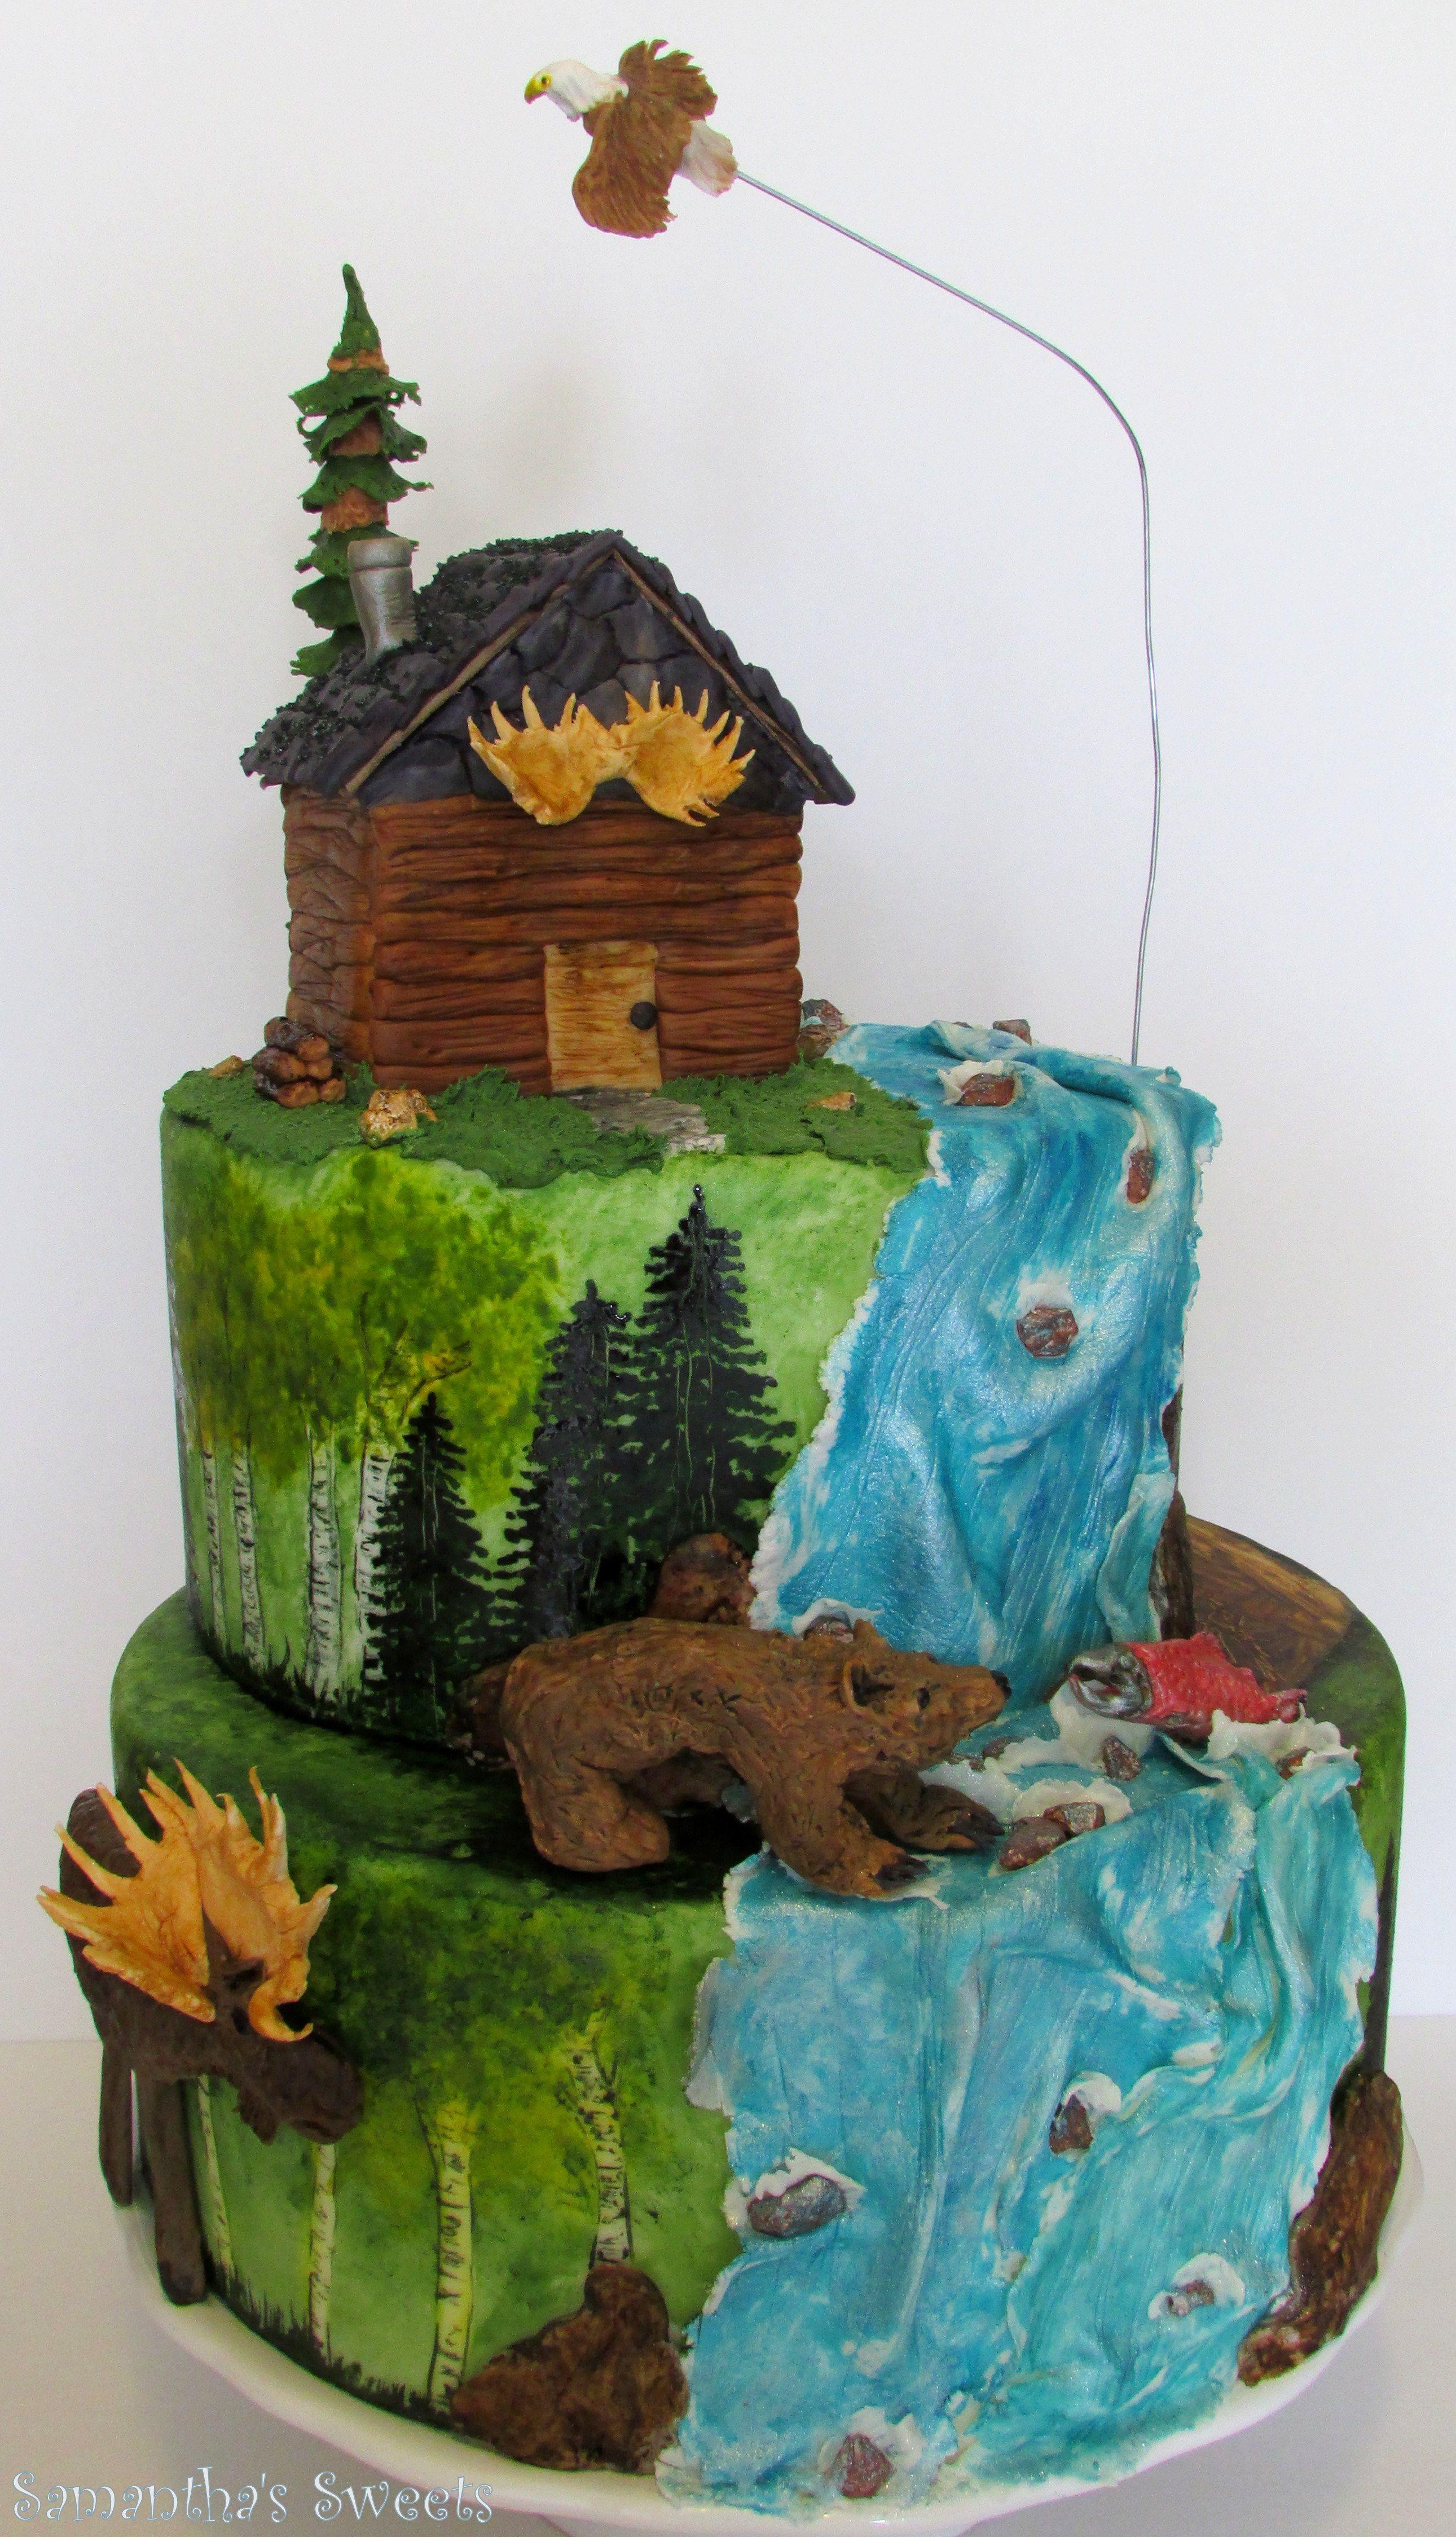 Outdoor Adventures Birthday Cake Samantha Sweets Hand